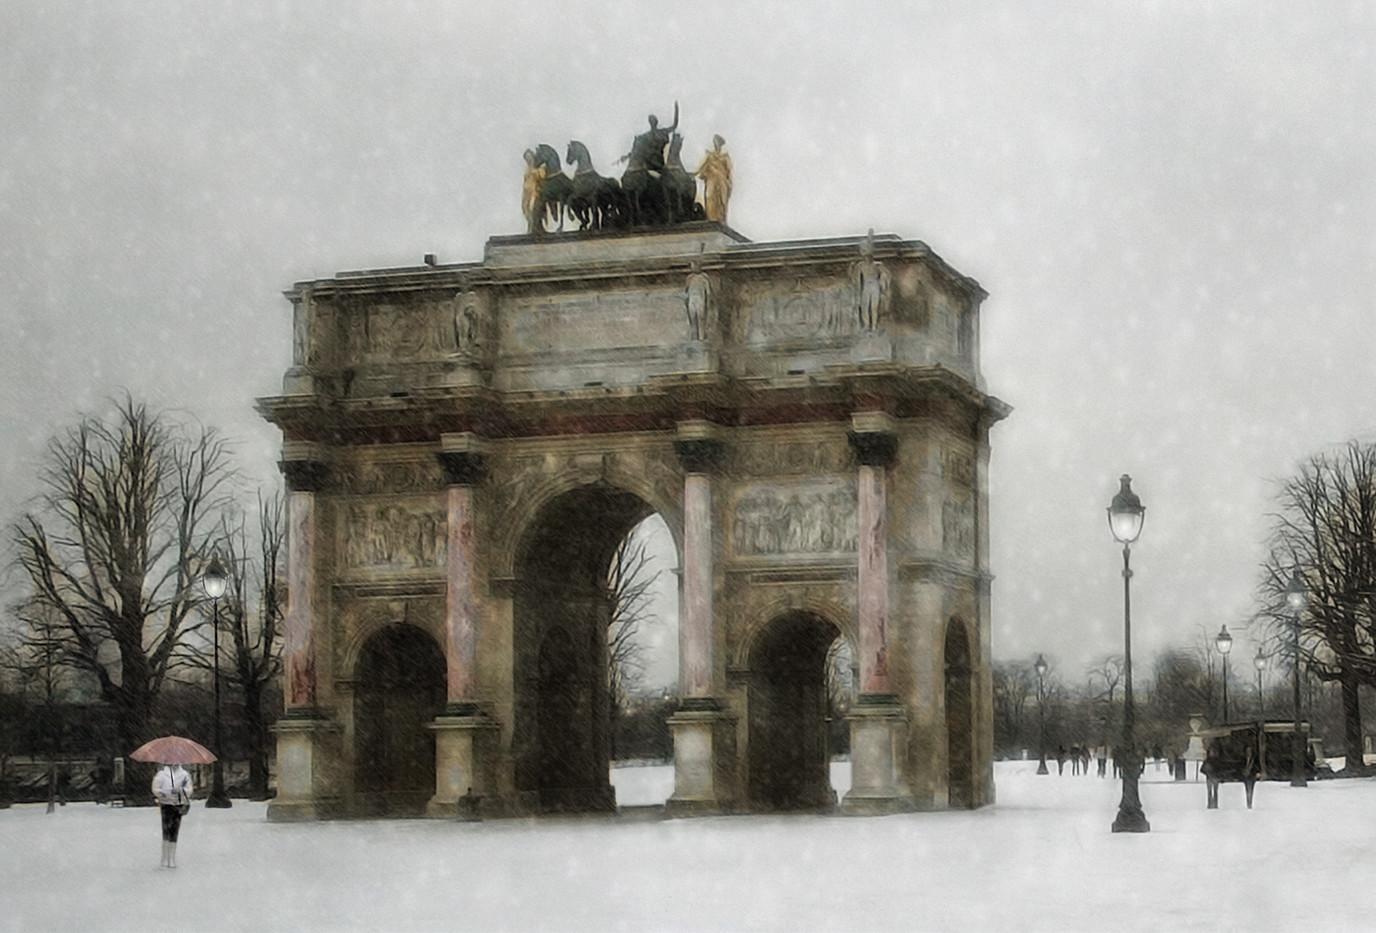 20 SNOW IN PARIS by Pam Sherren